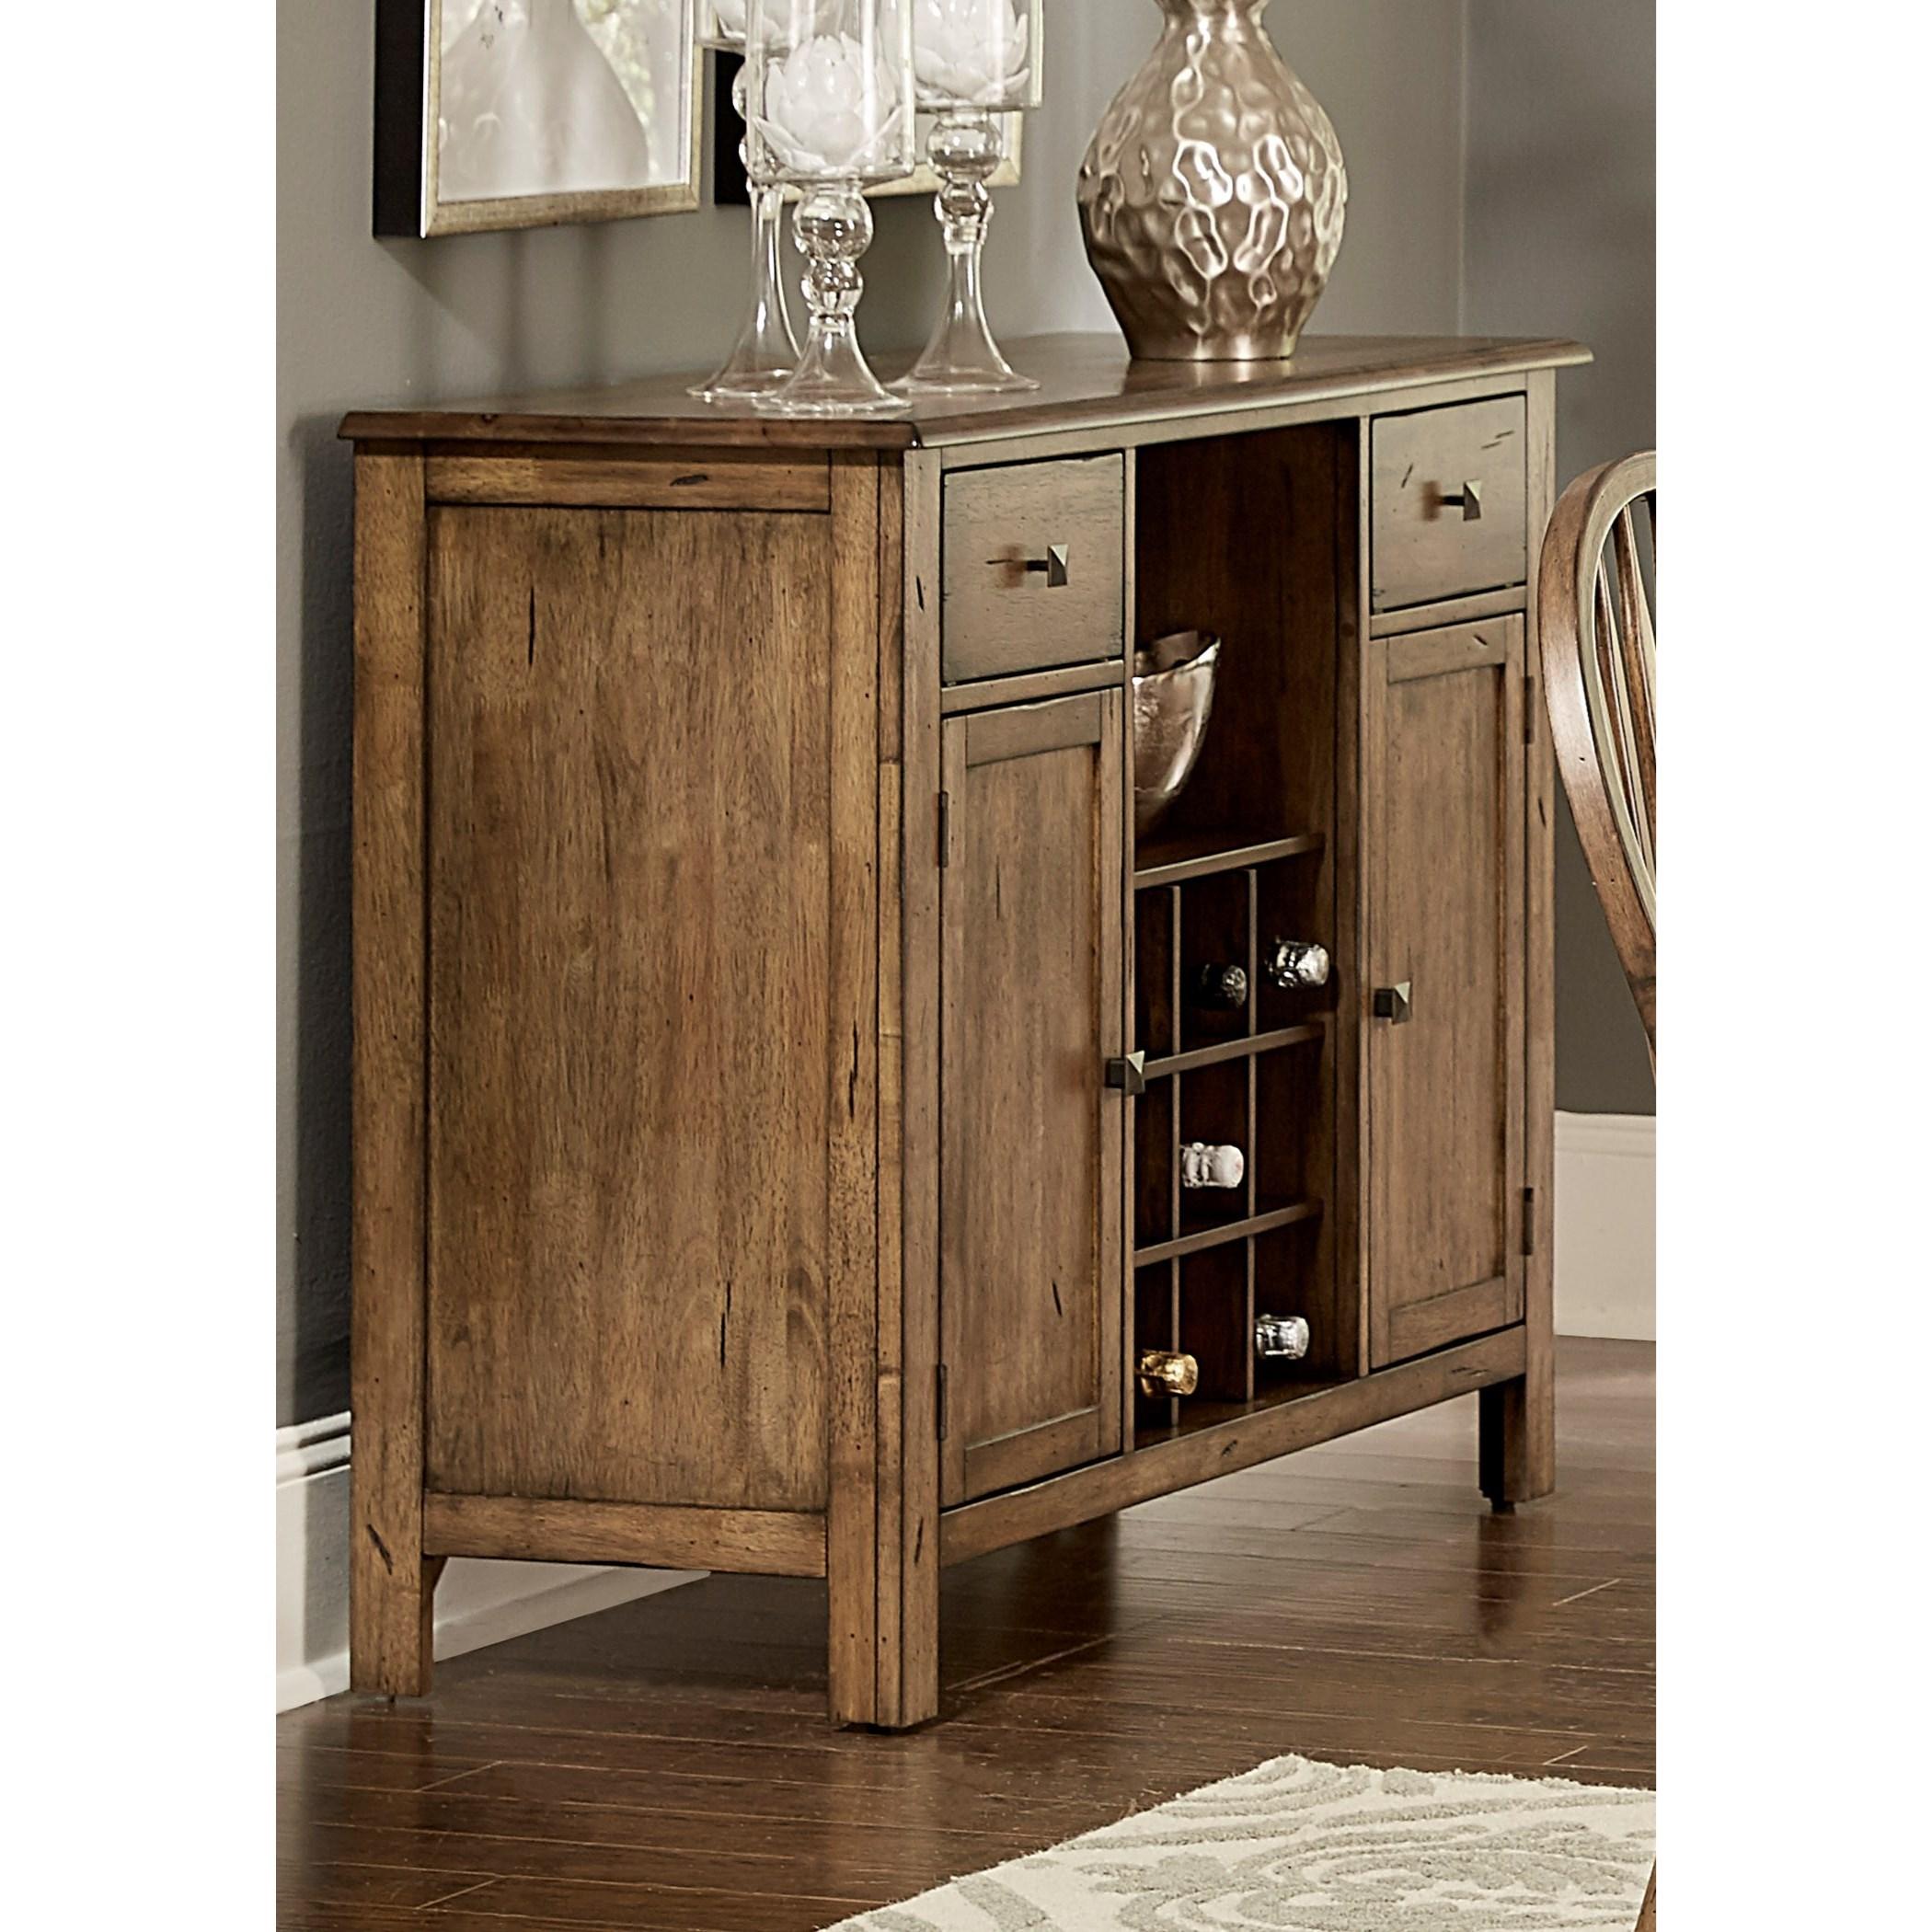 Carolina Crossing Dining Server by Liberty Furniture at Lapeer Furniture & Mattress Center